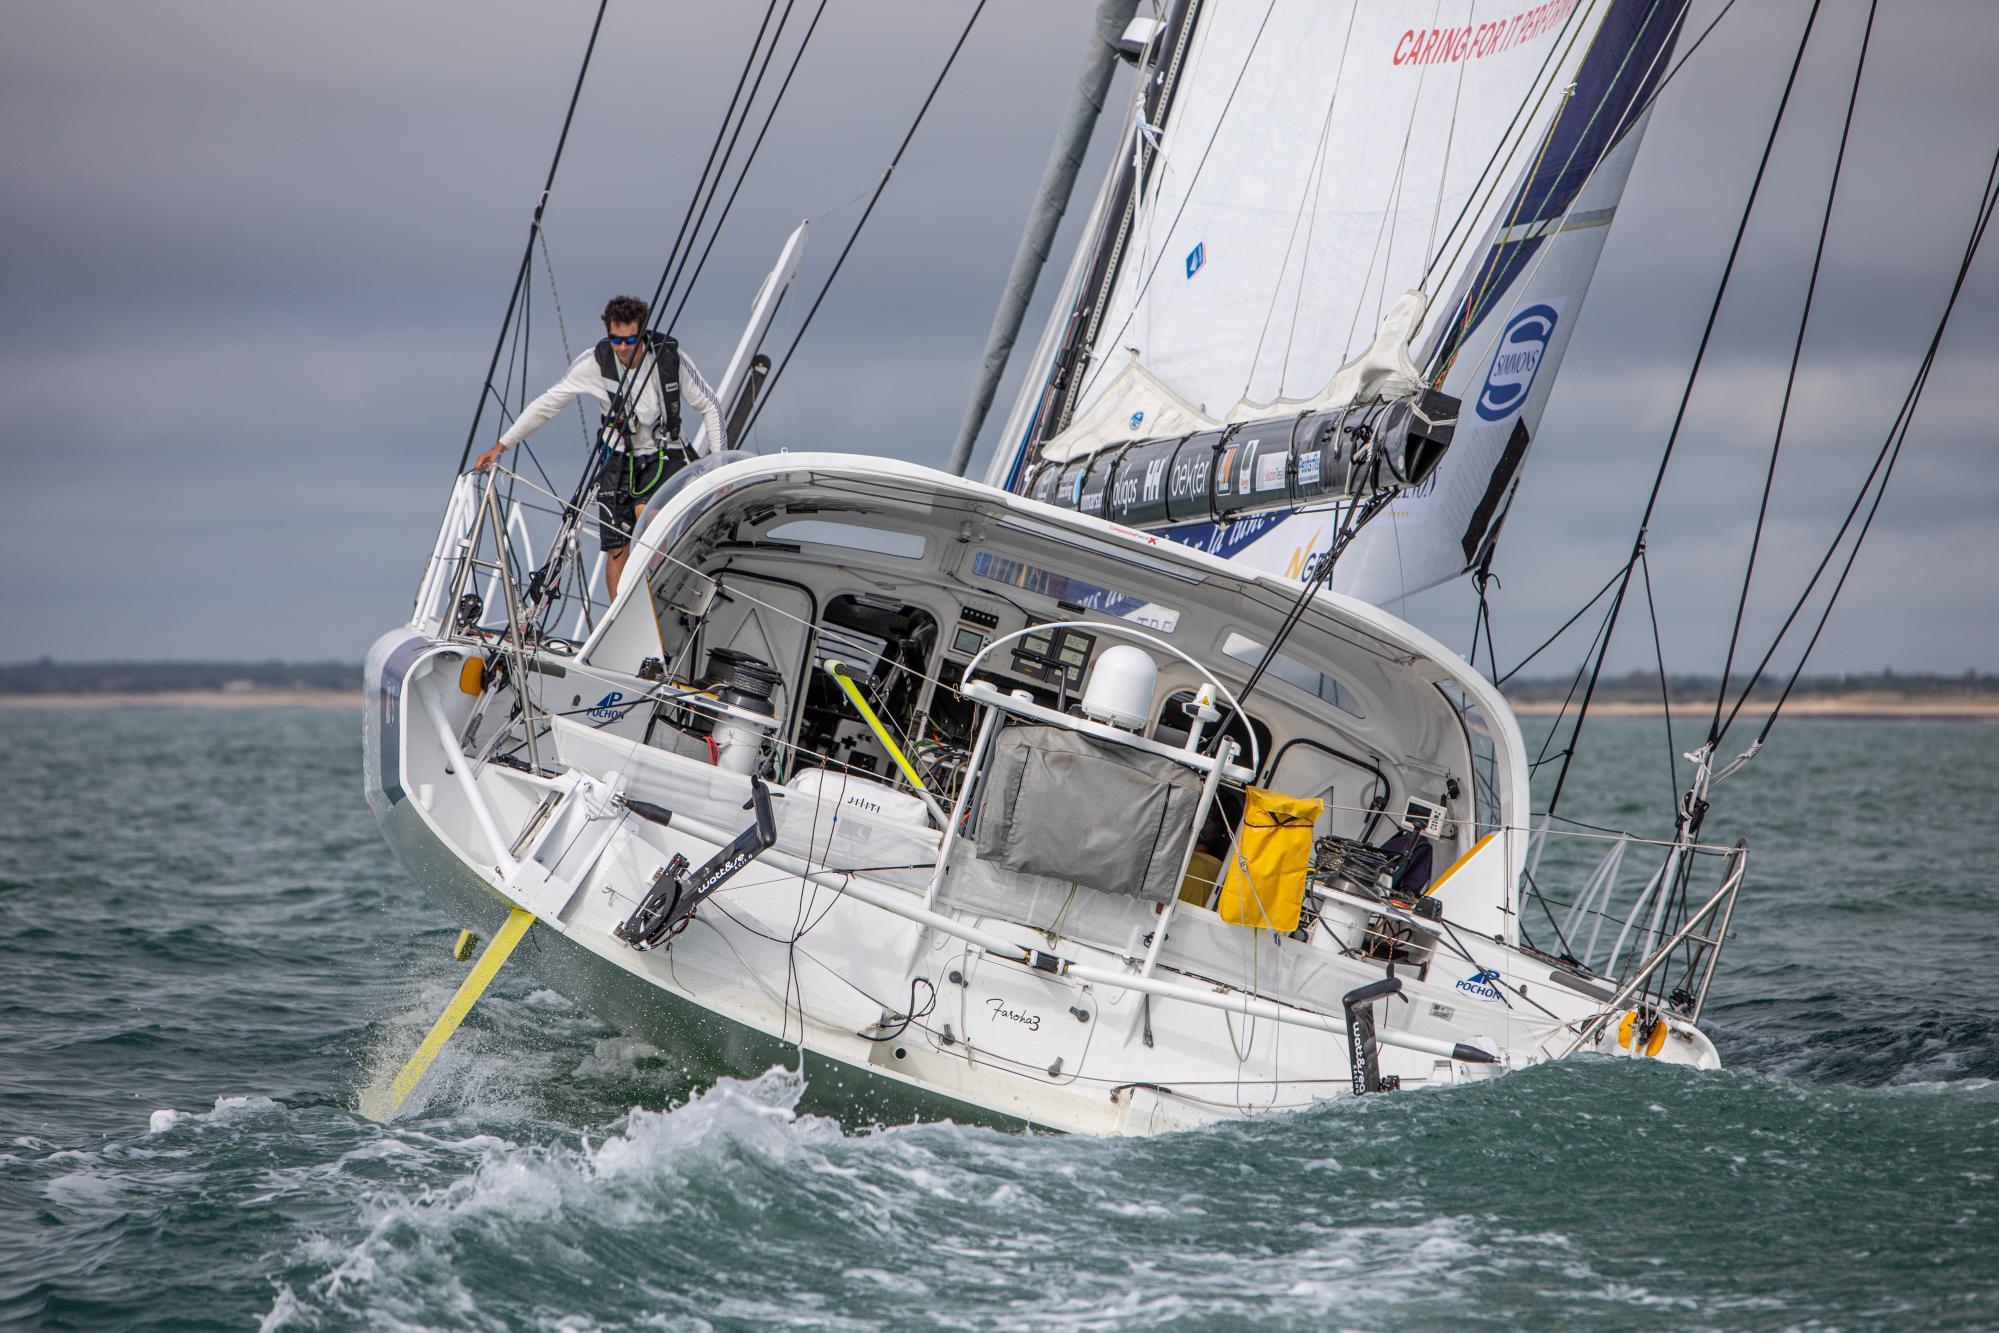 Clément Giraud - Skipper Vendée Globe 2020 - vue de l'arrière © Vincent Olivaud